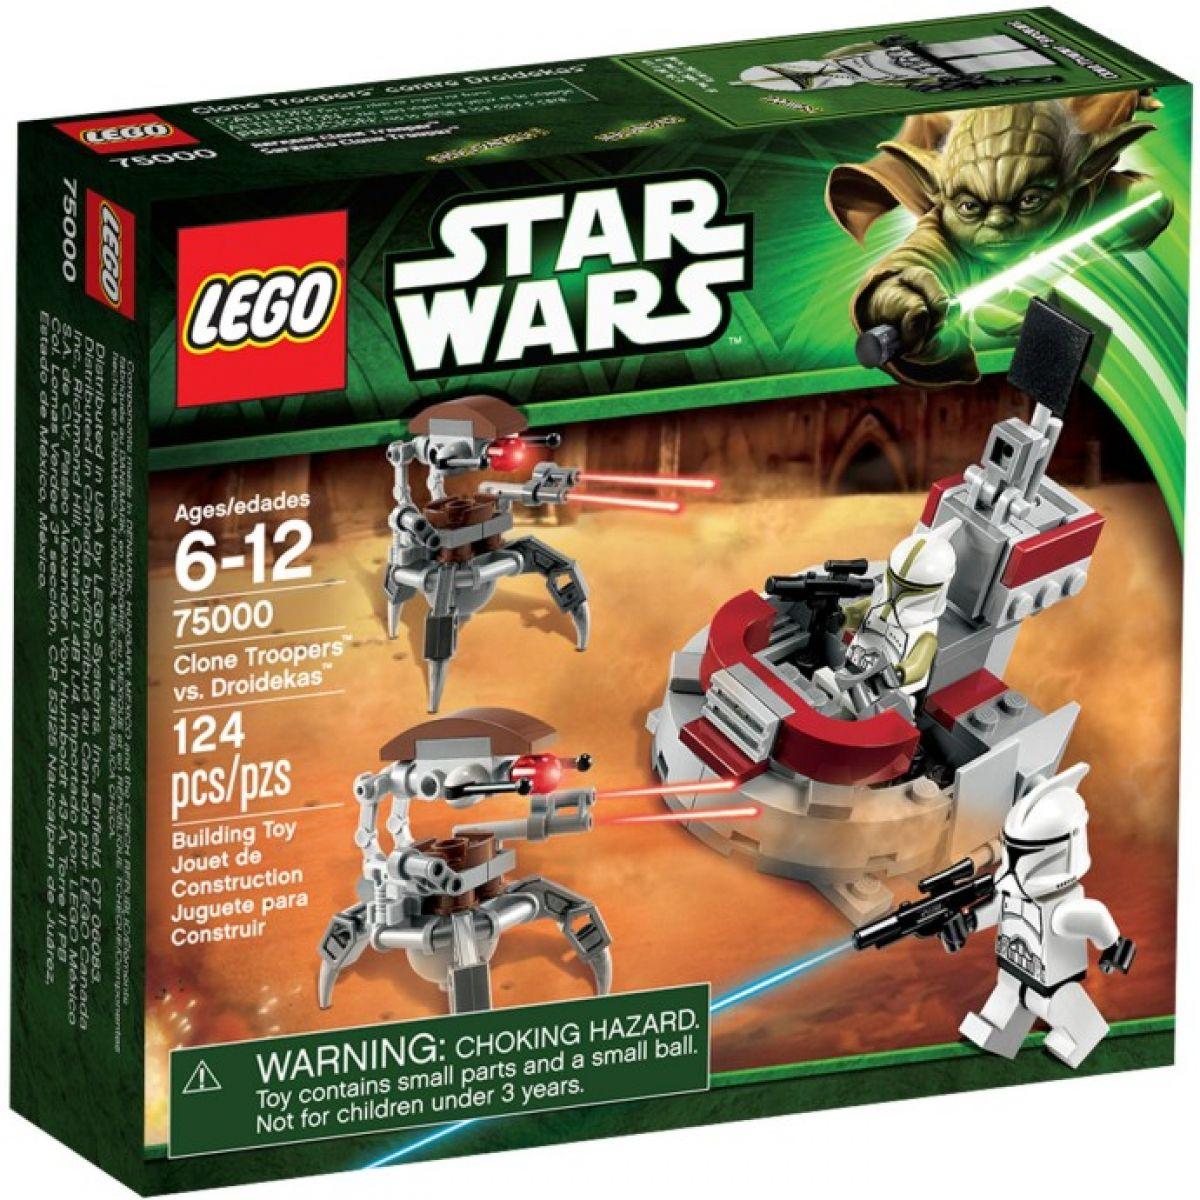 LEGO Star Wars 75000 Clone Trooper vs. Droidekas